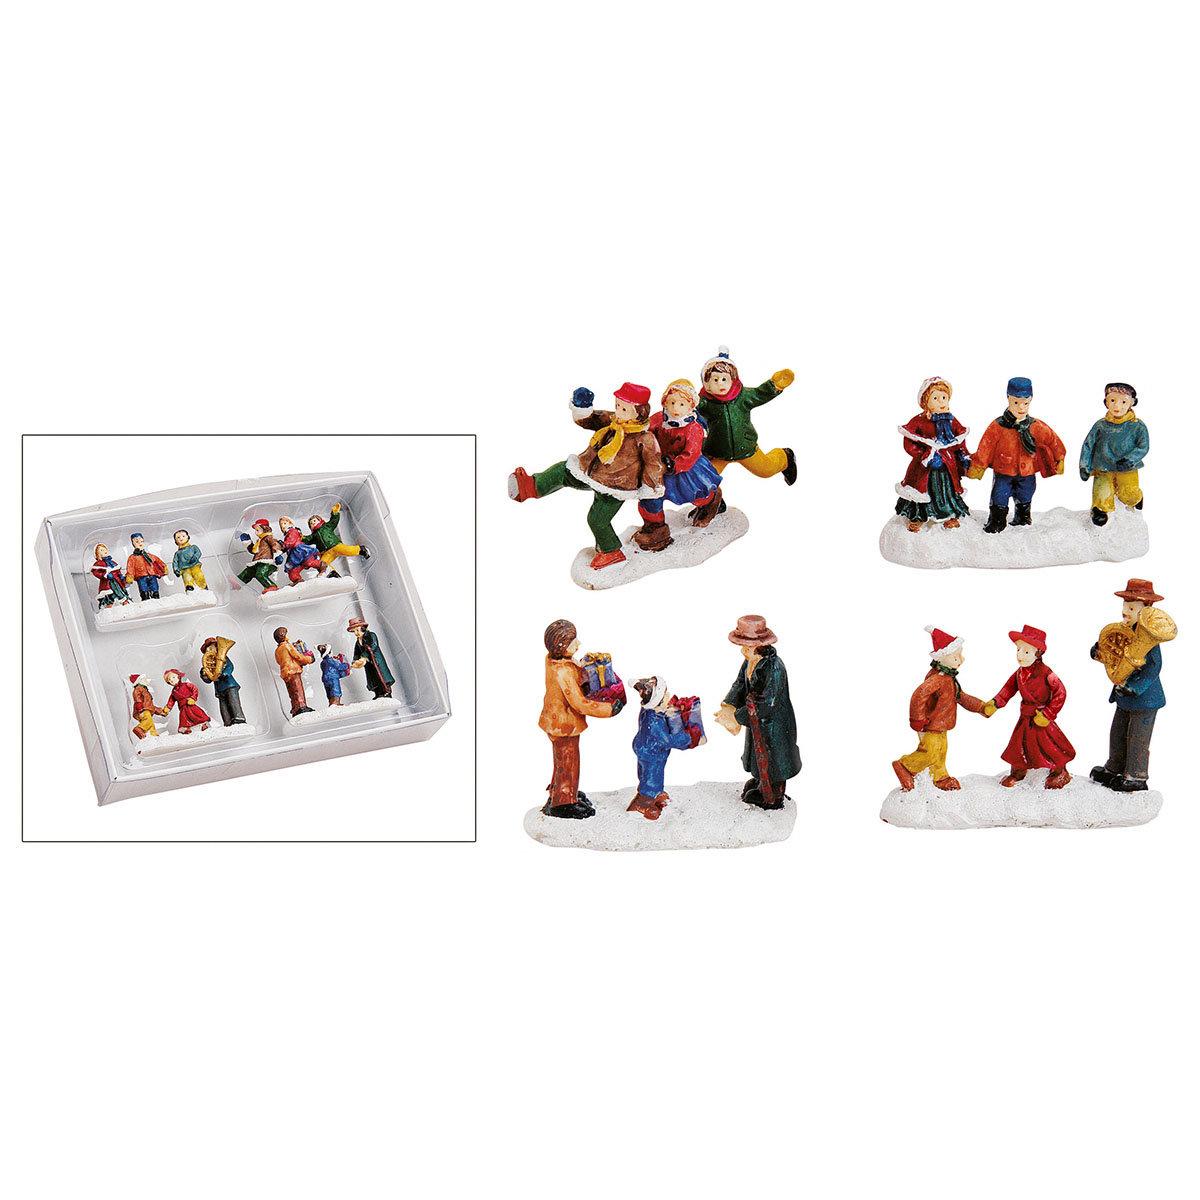 Miniatur-Winterfiguren Weihnachtsfreude, 4er-Set   #2